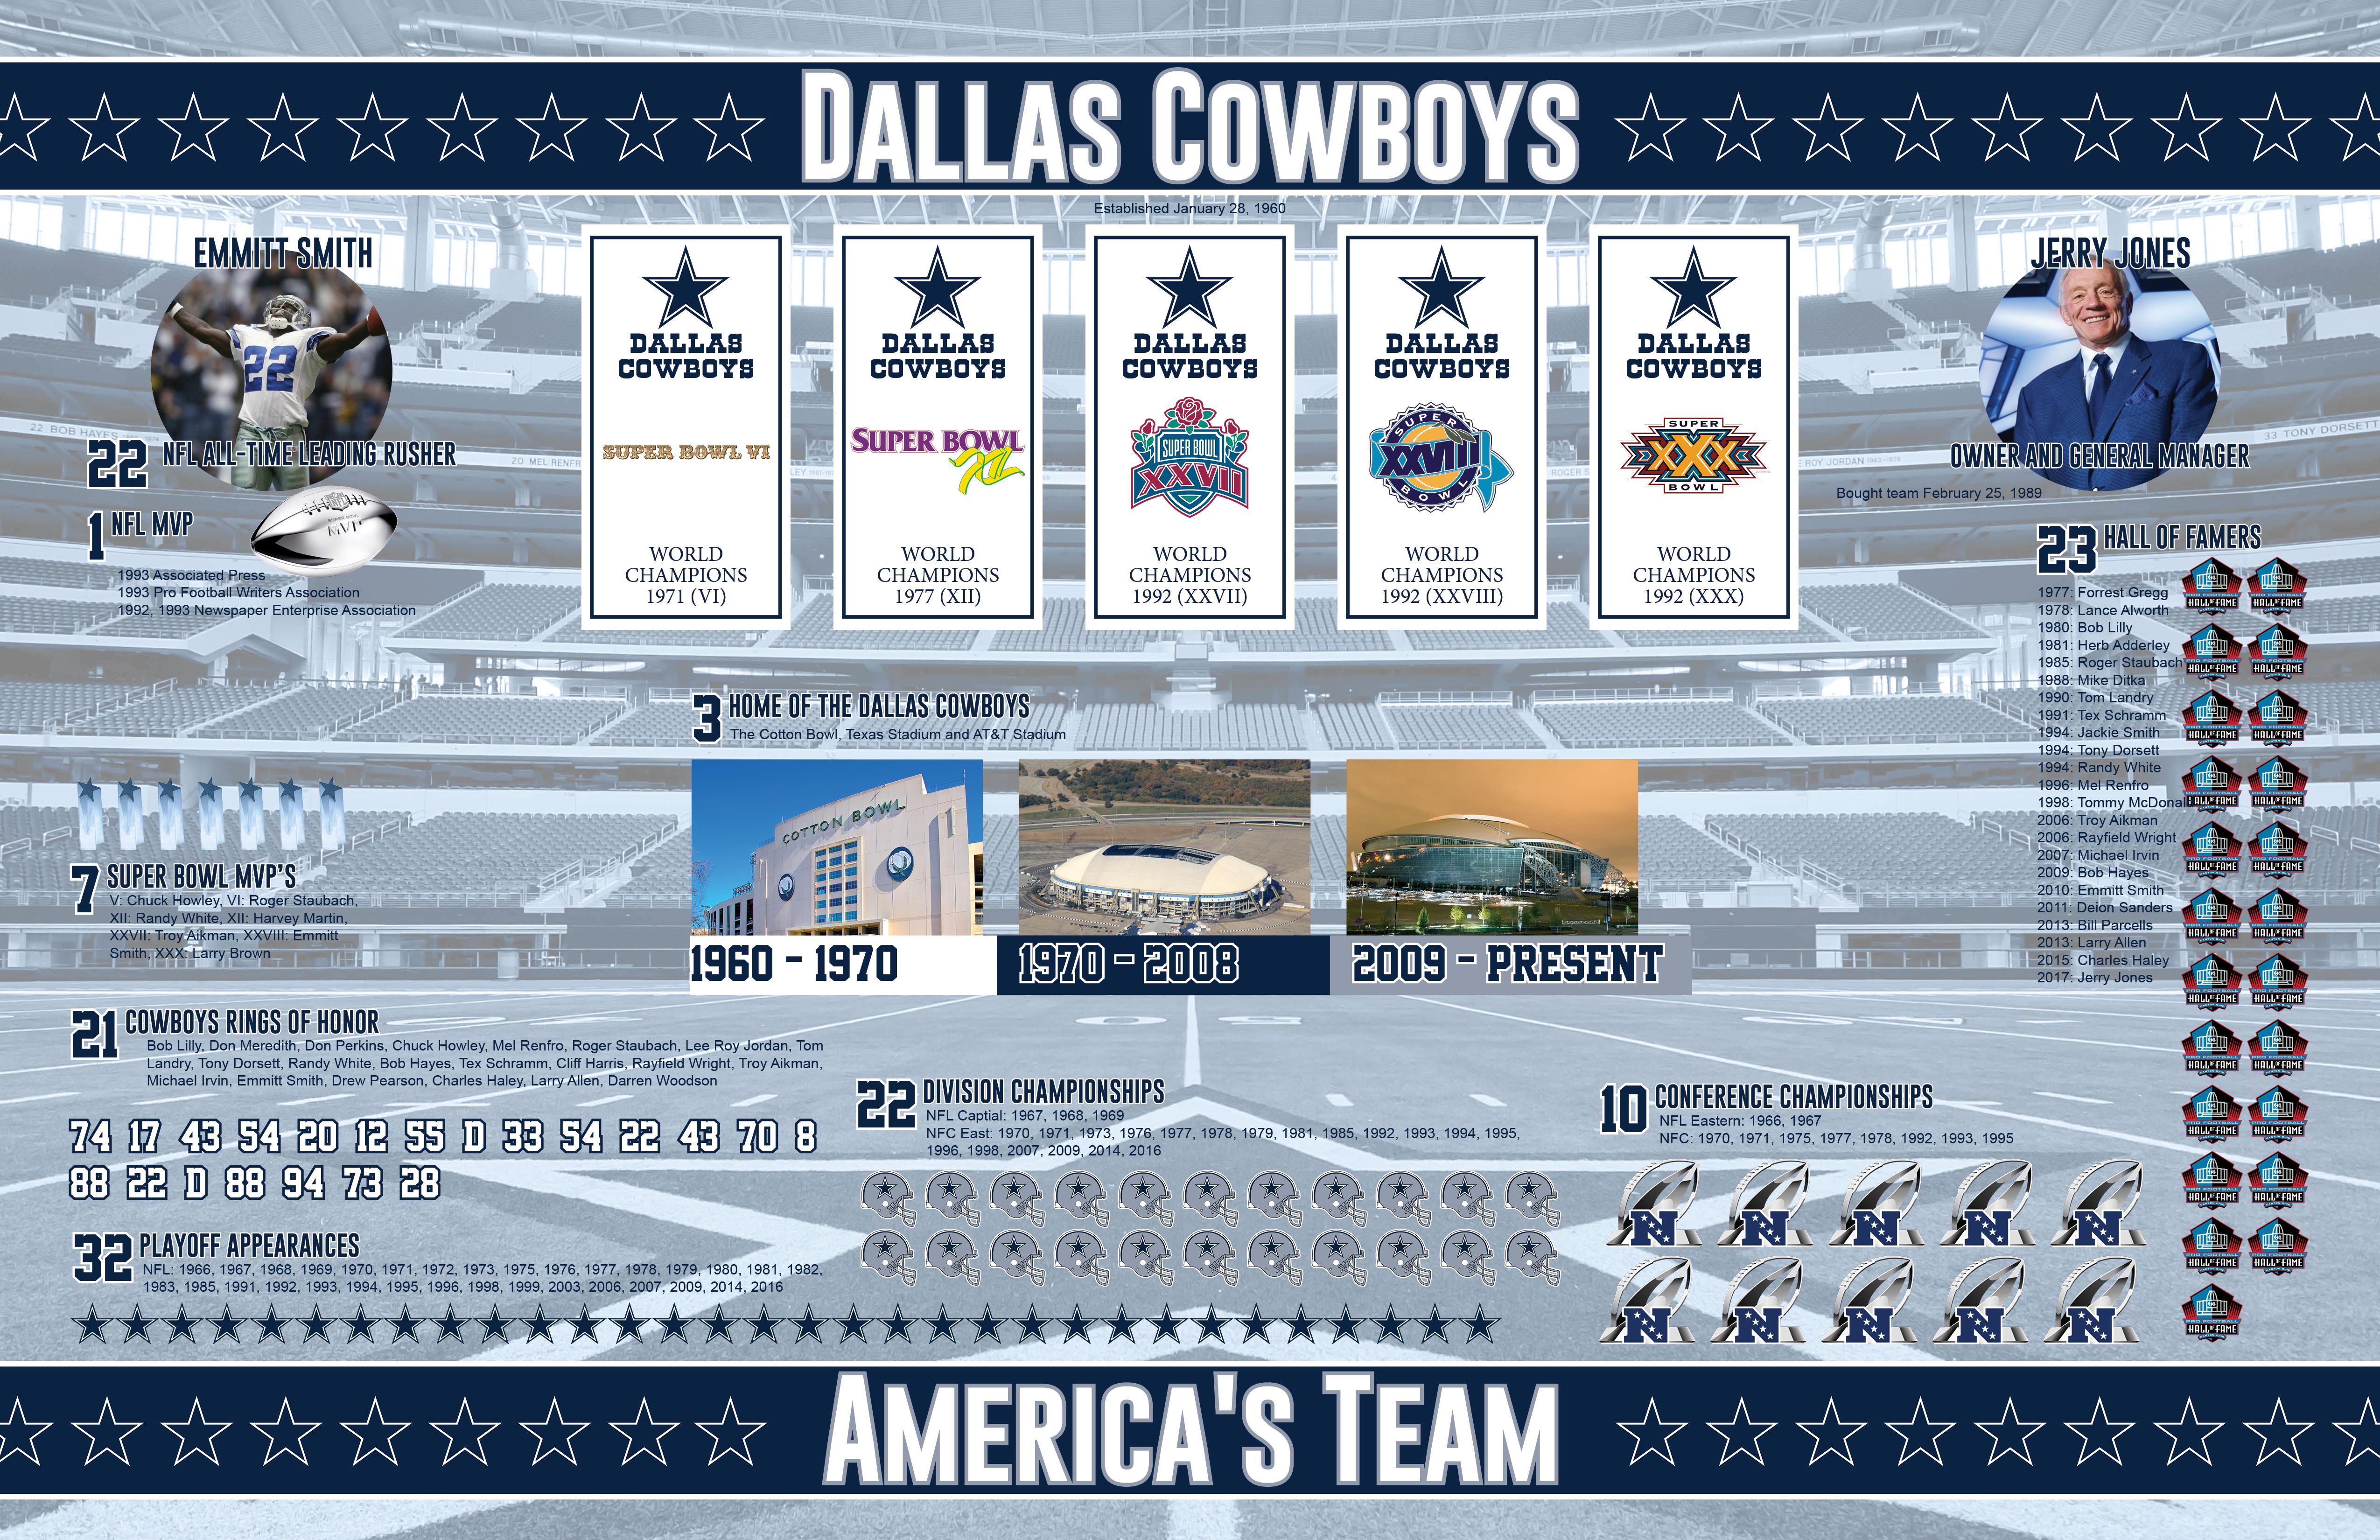 Dallas Cowboys Infographic